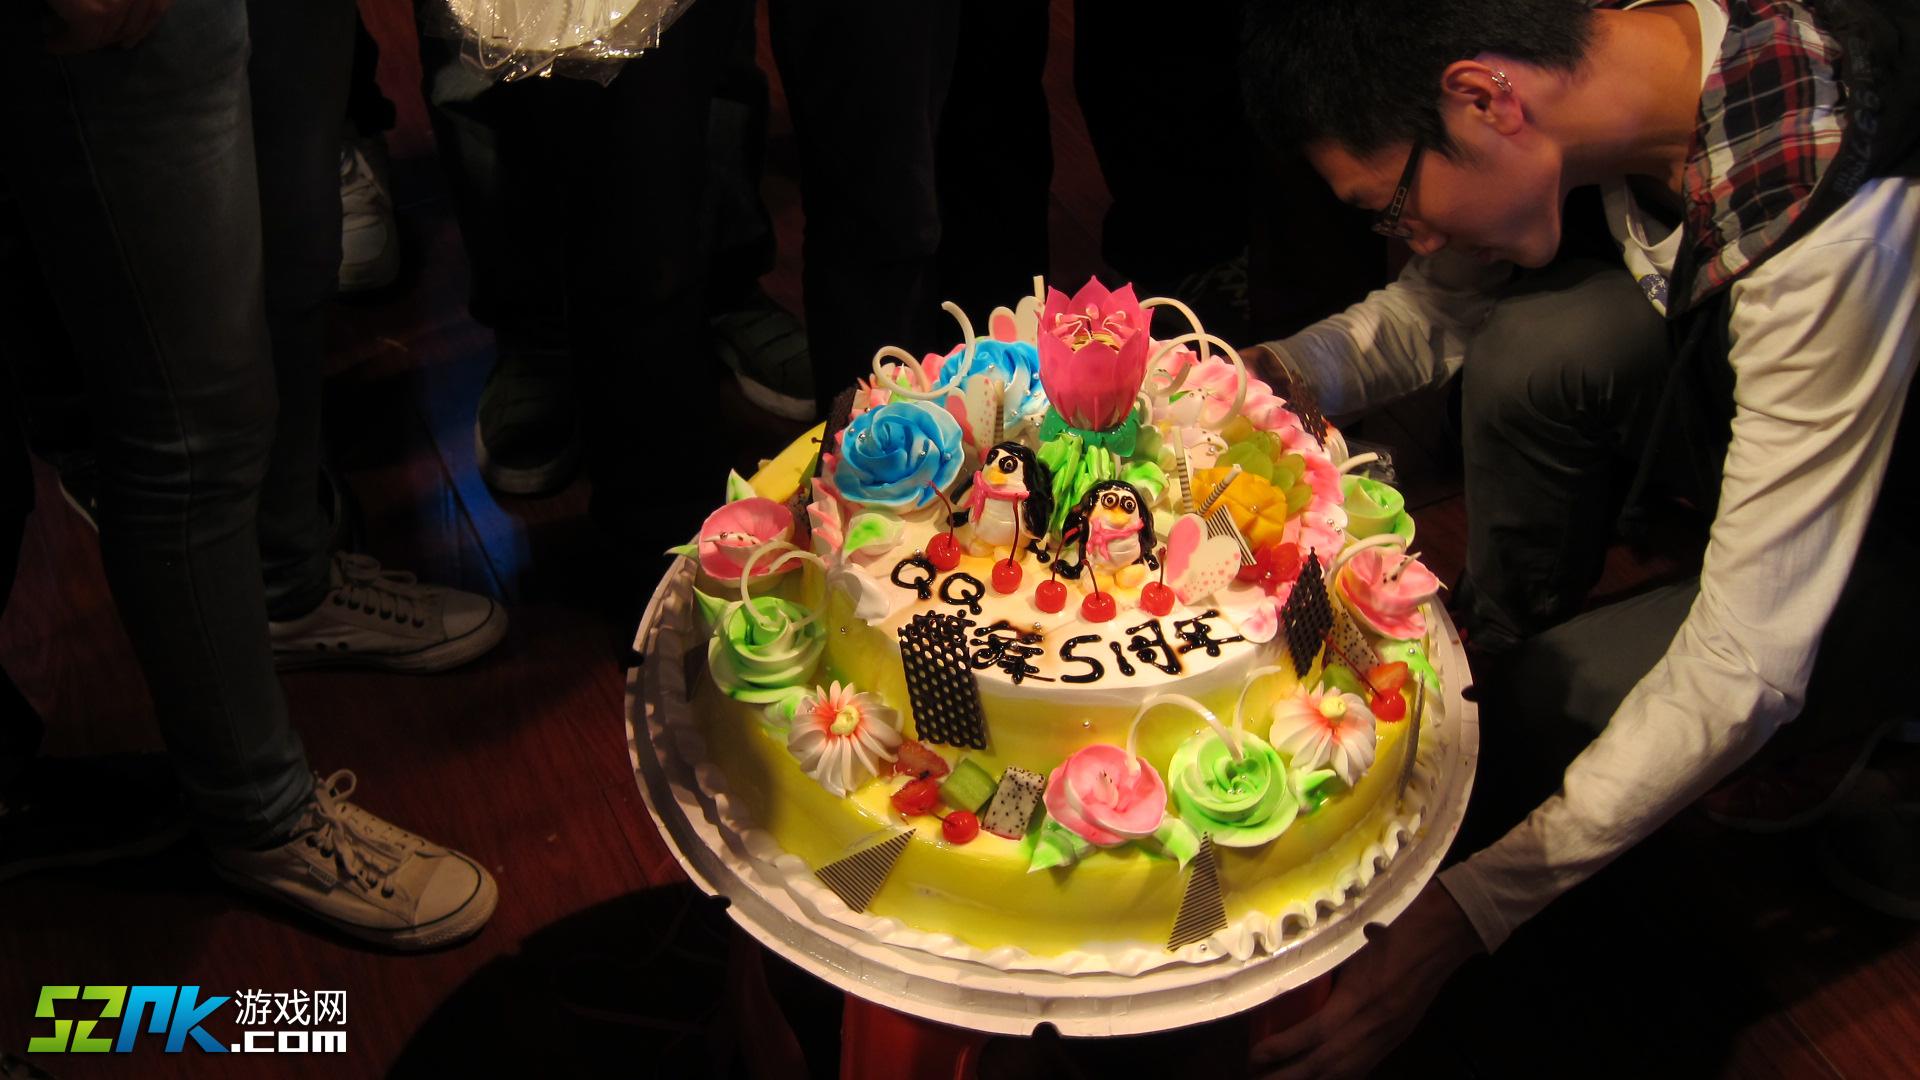 qq 炫舞/QQ炫舞五周年蛋糕